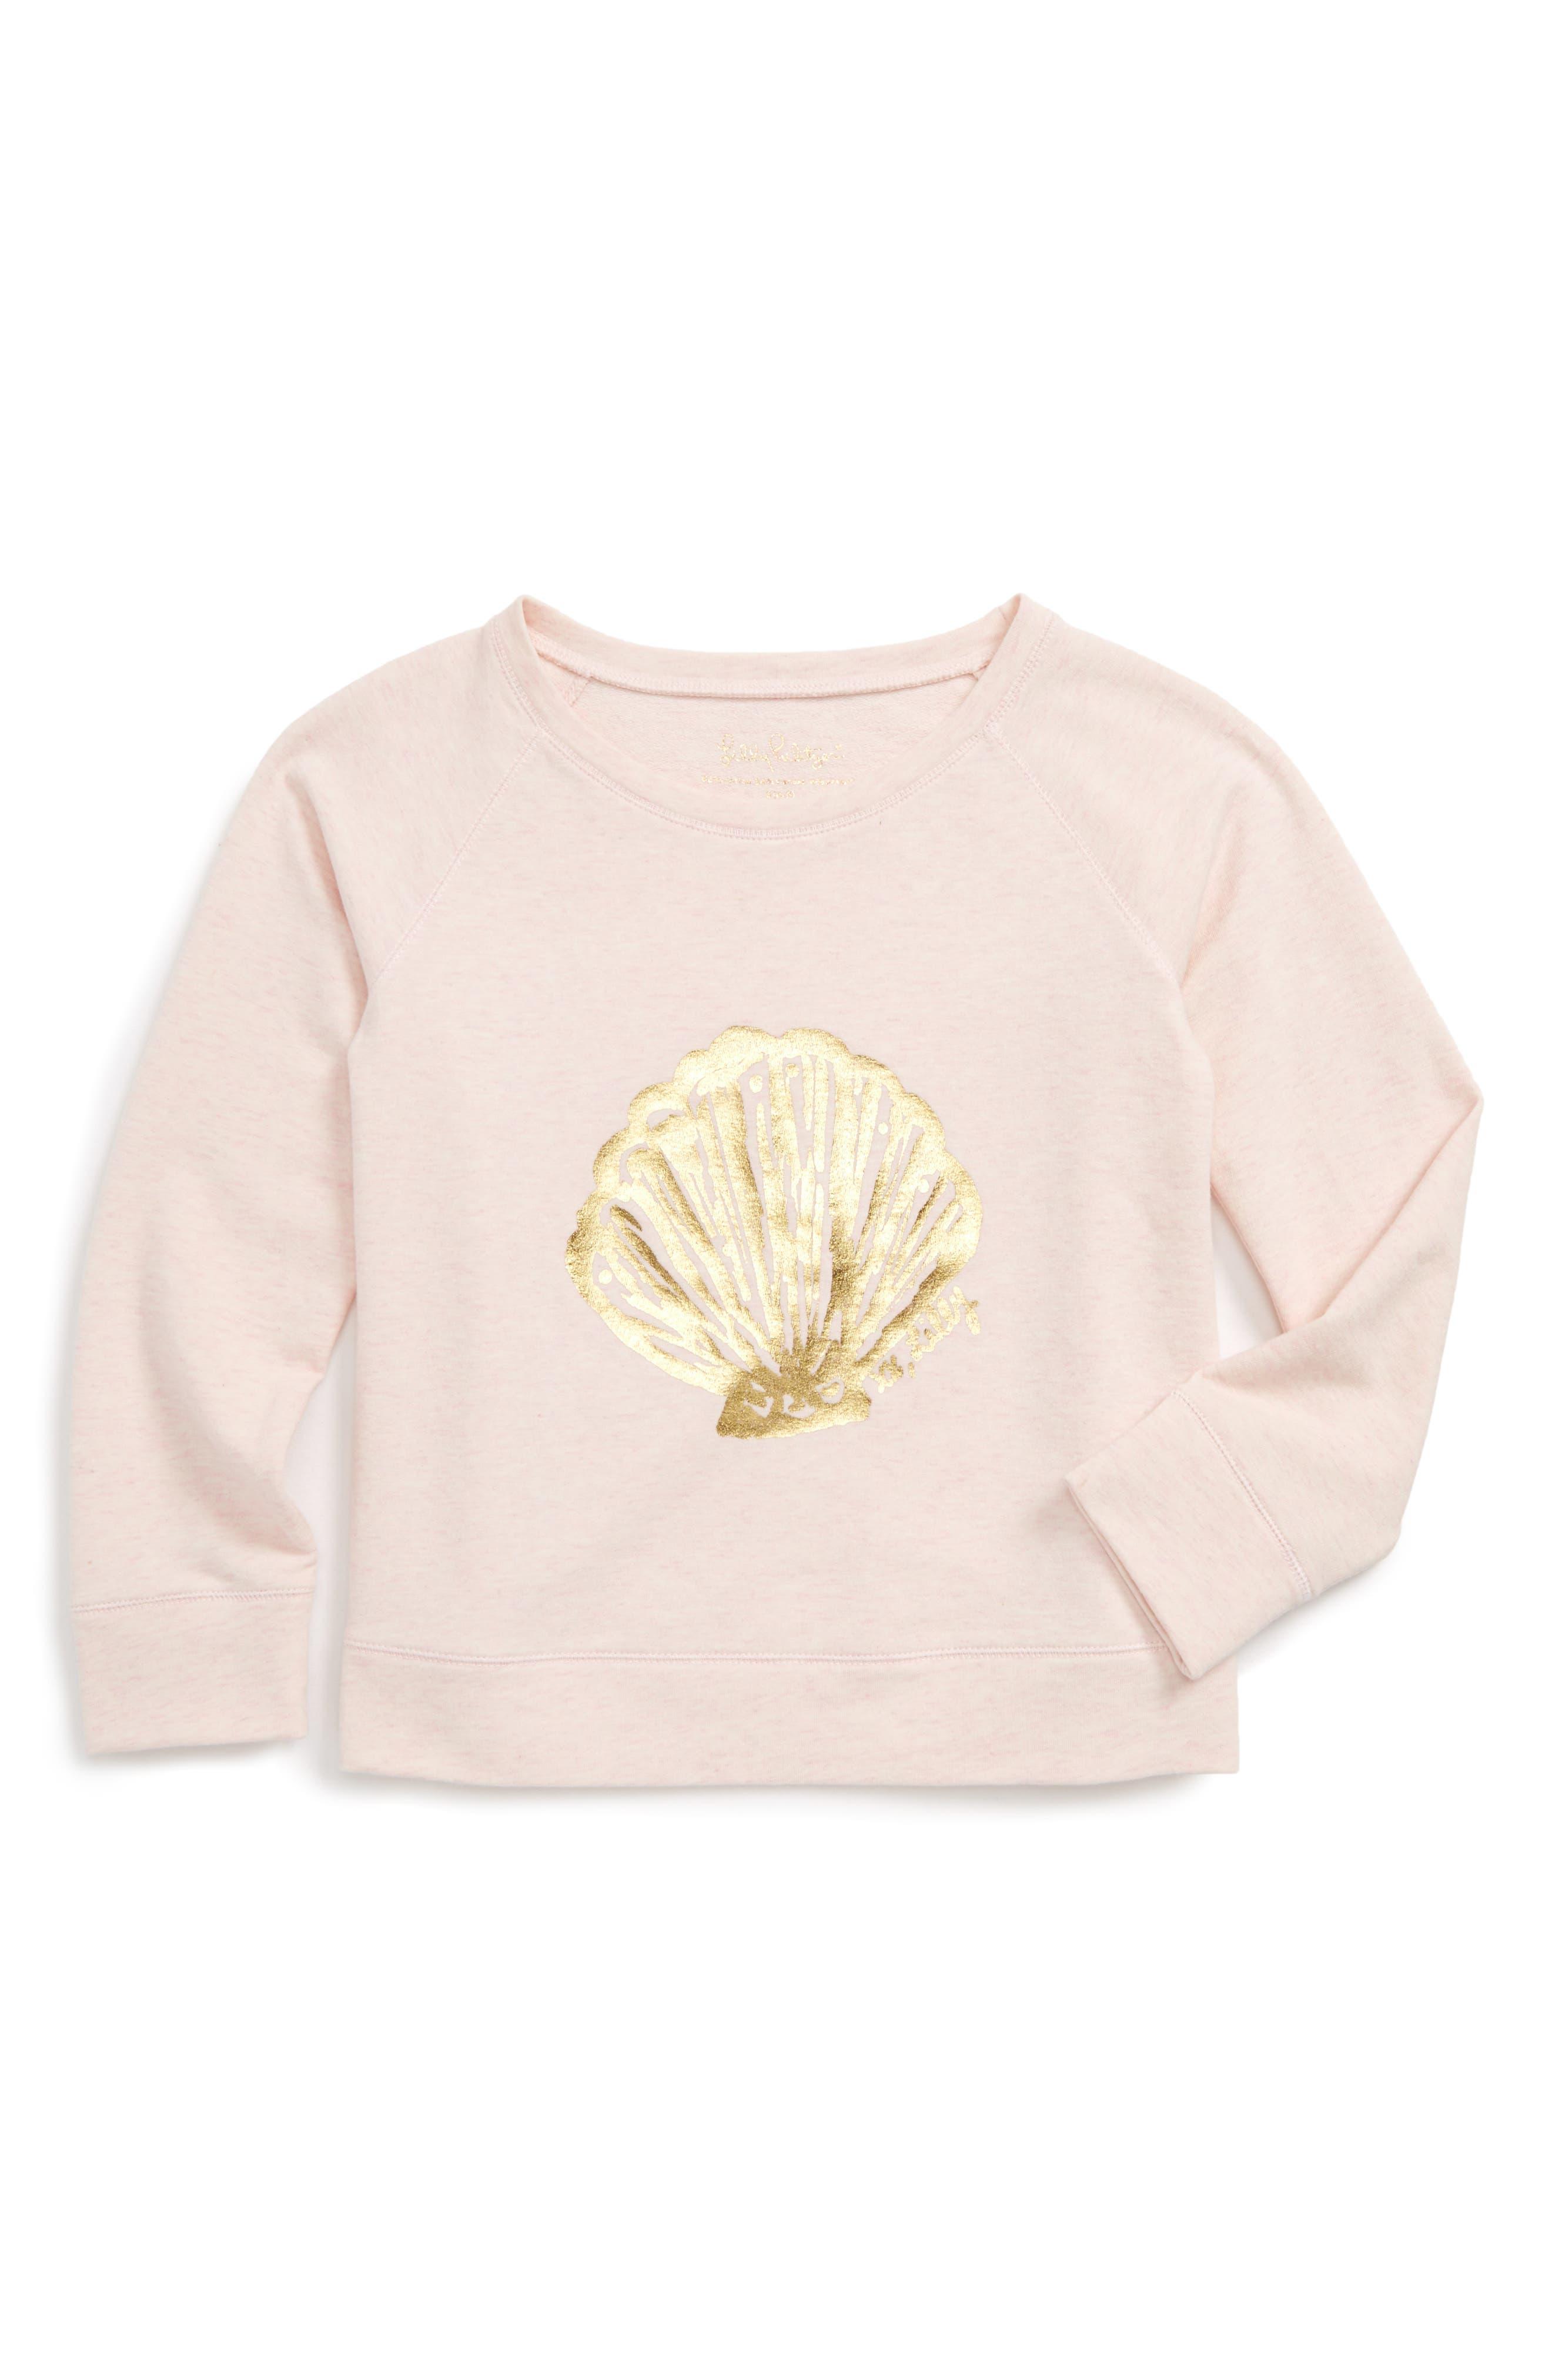 Main Image - Lilly Pulitzer Shara Graphic Print Sweatshirt (Toddler Girls, Little Girls & Big Girls)